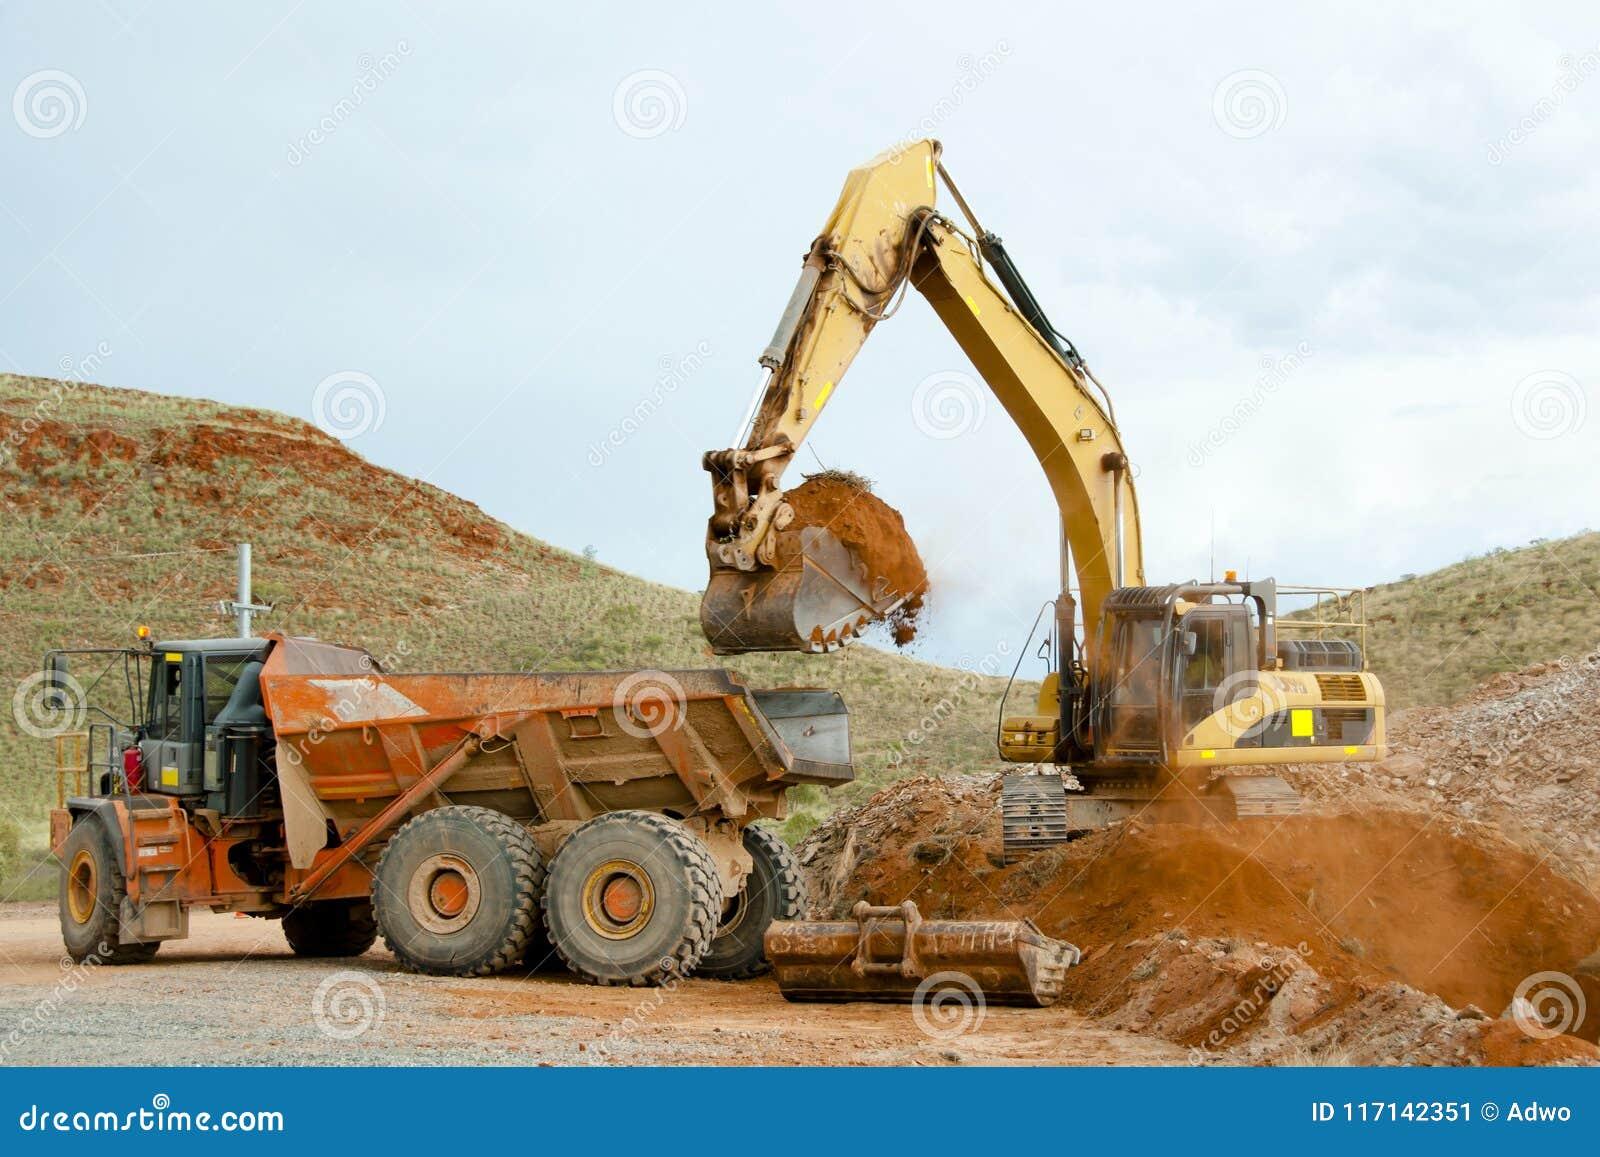 Mining Machinery Earthworks